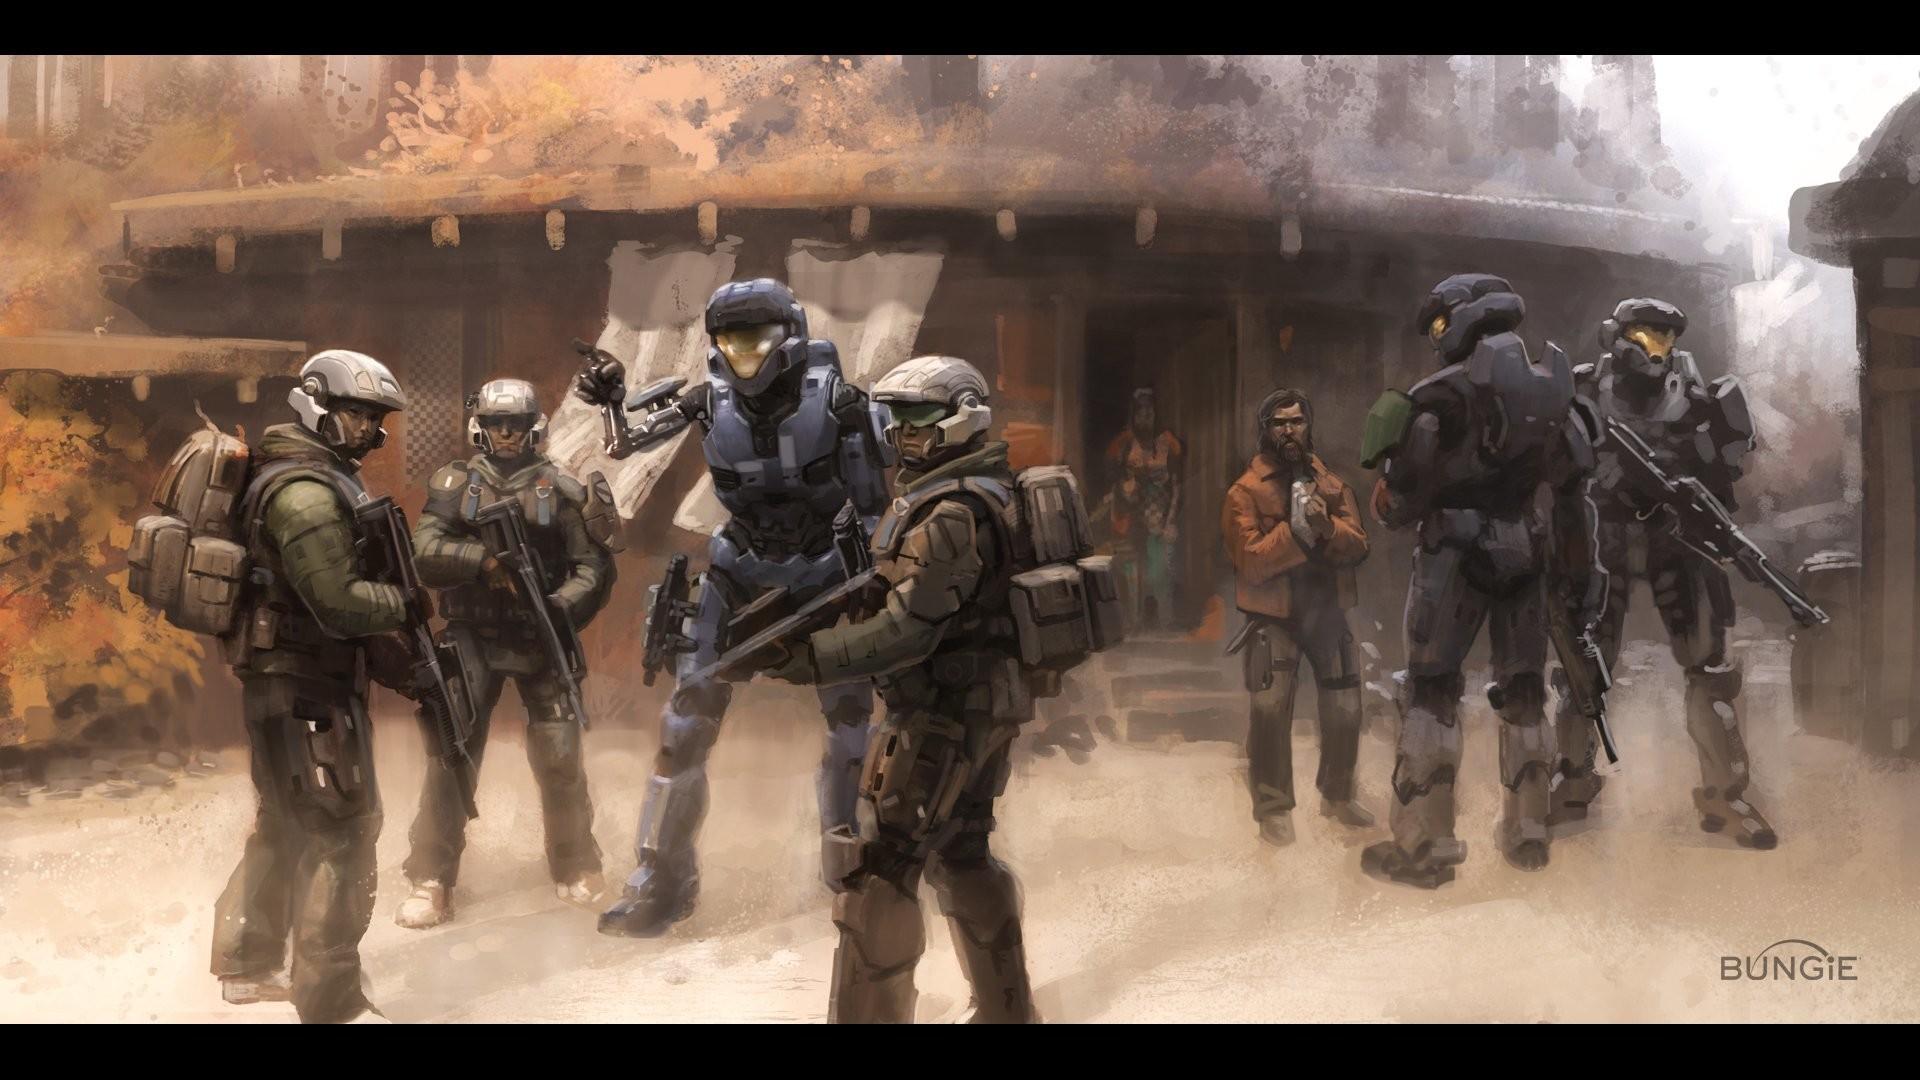 Res: 1920x1080, Spartan Halo Kat Halo Reach concept art Bungie wallpaper |  |  253859 | WallpaperUP